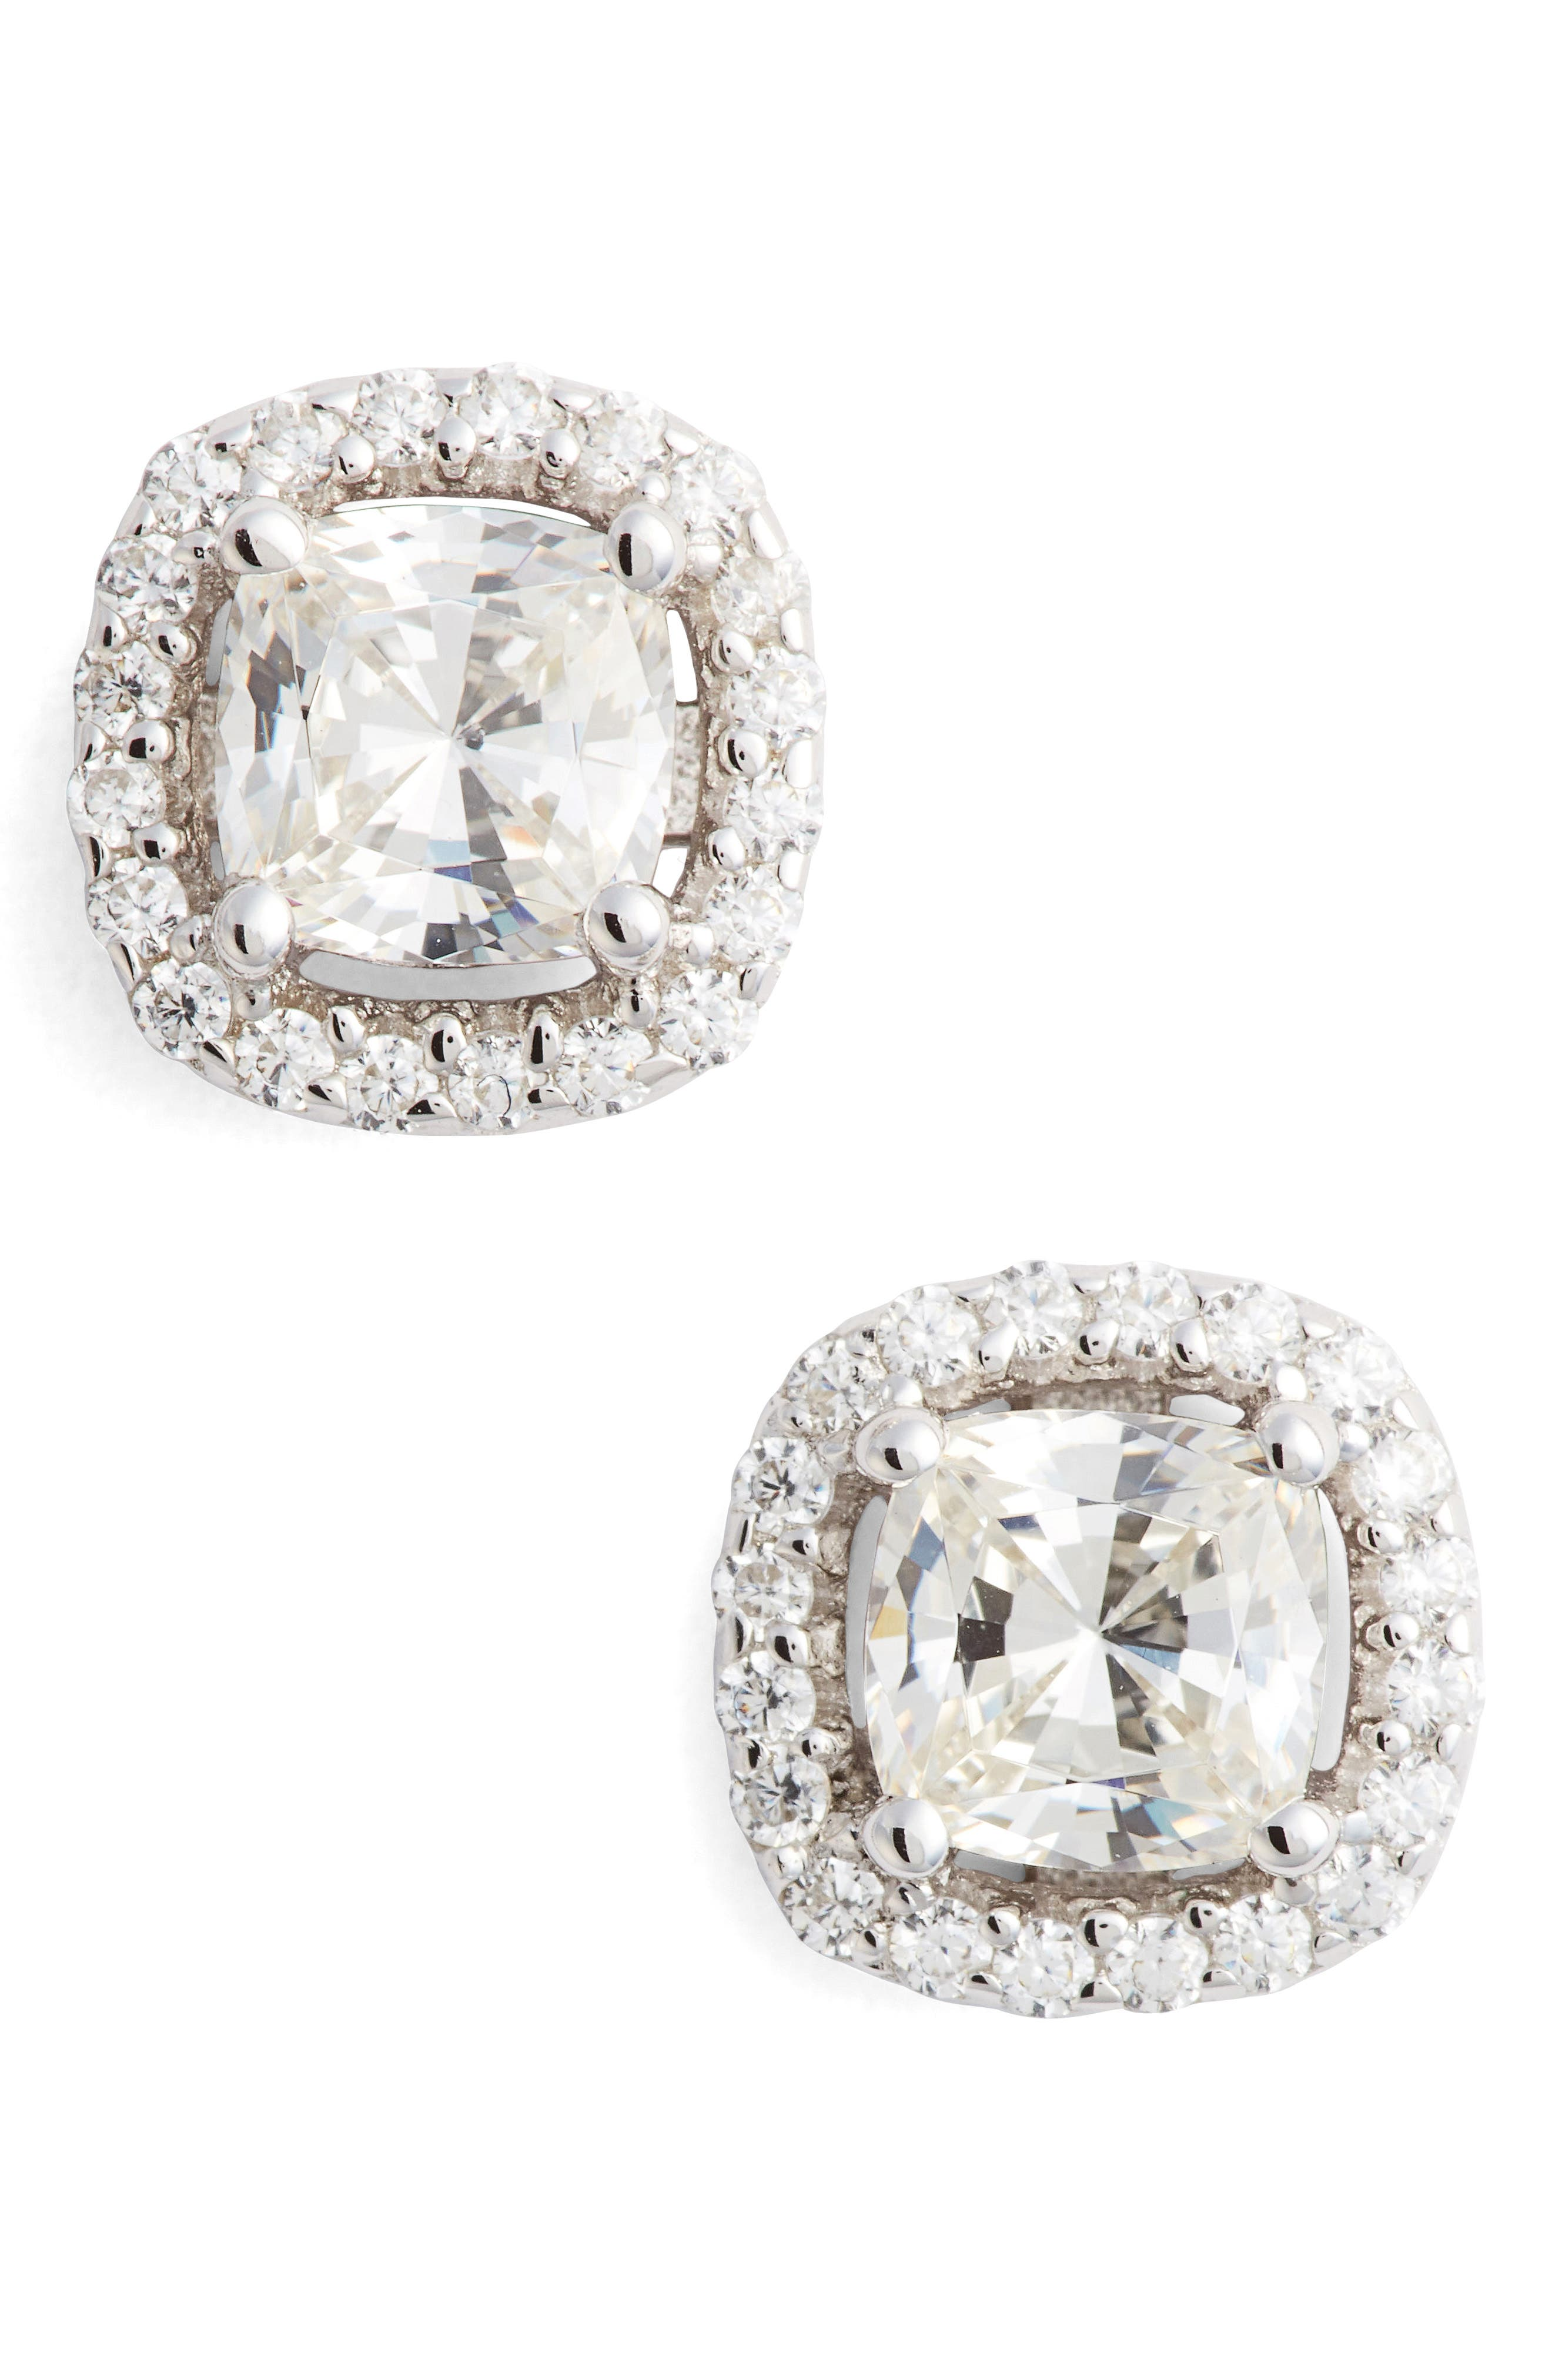 Cushion Cut Simulated Diamond Stud Earrings,                             Main thumbnail 1, color,                             SILVER/ CLEAR